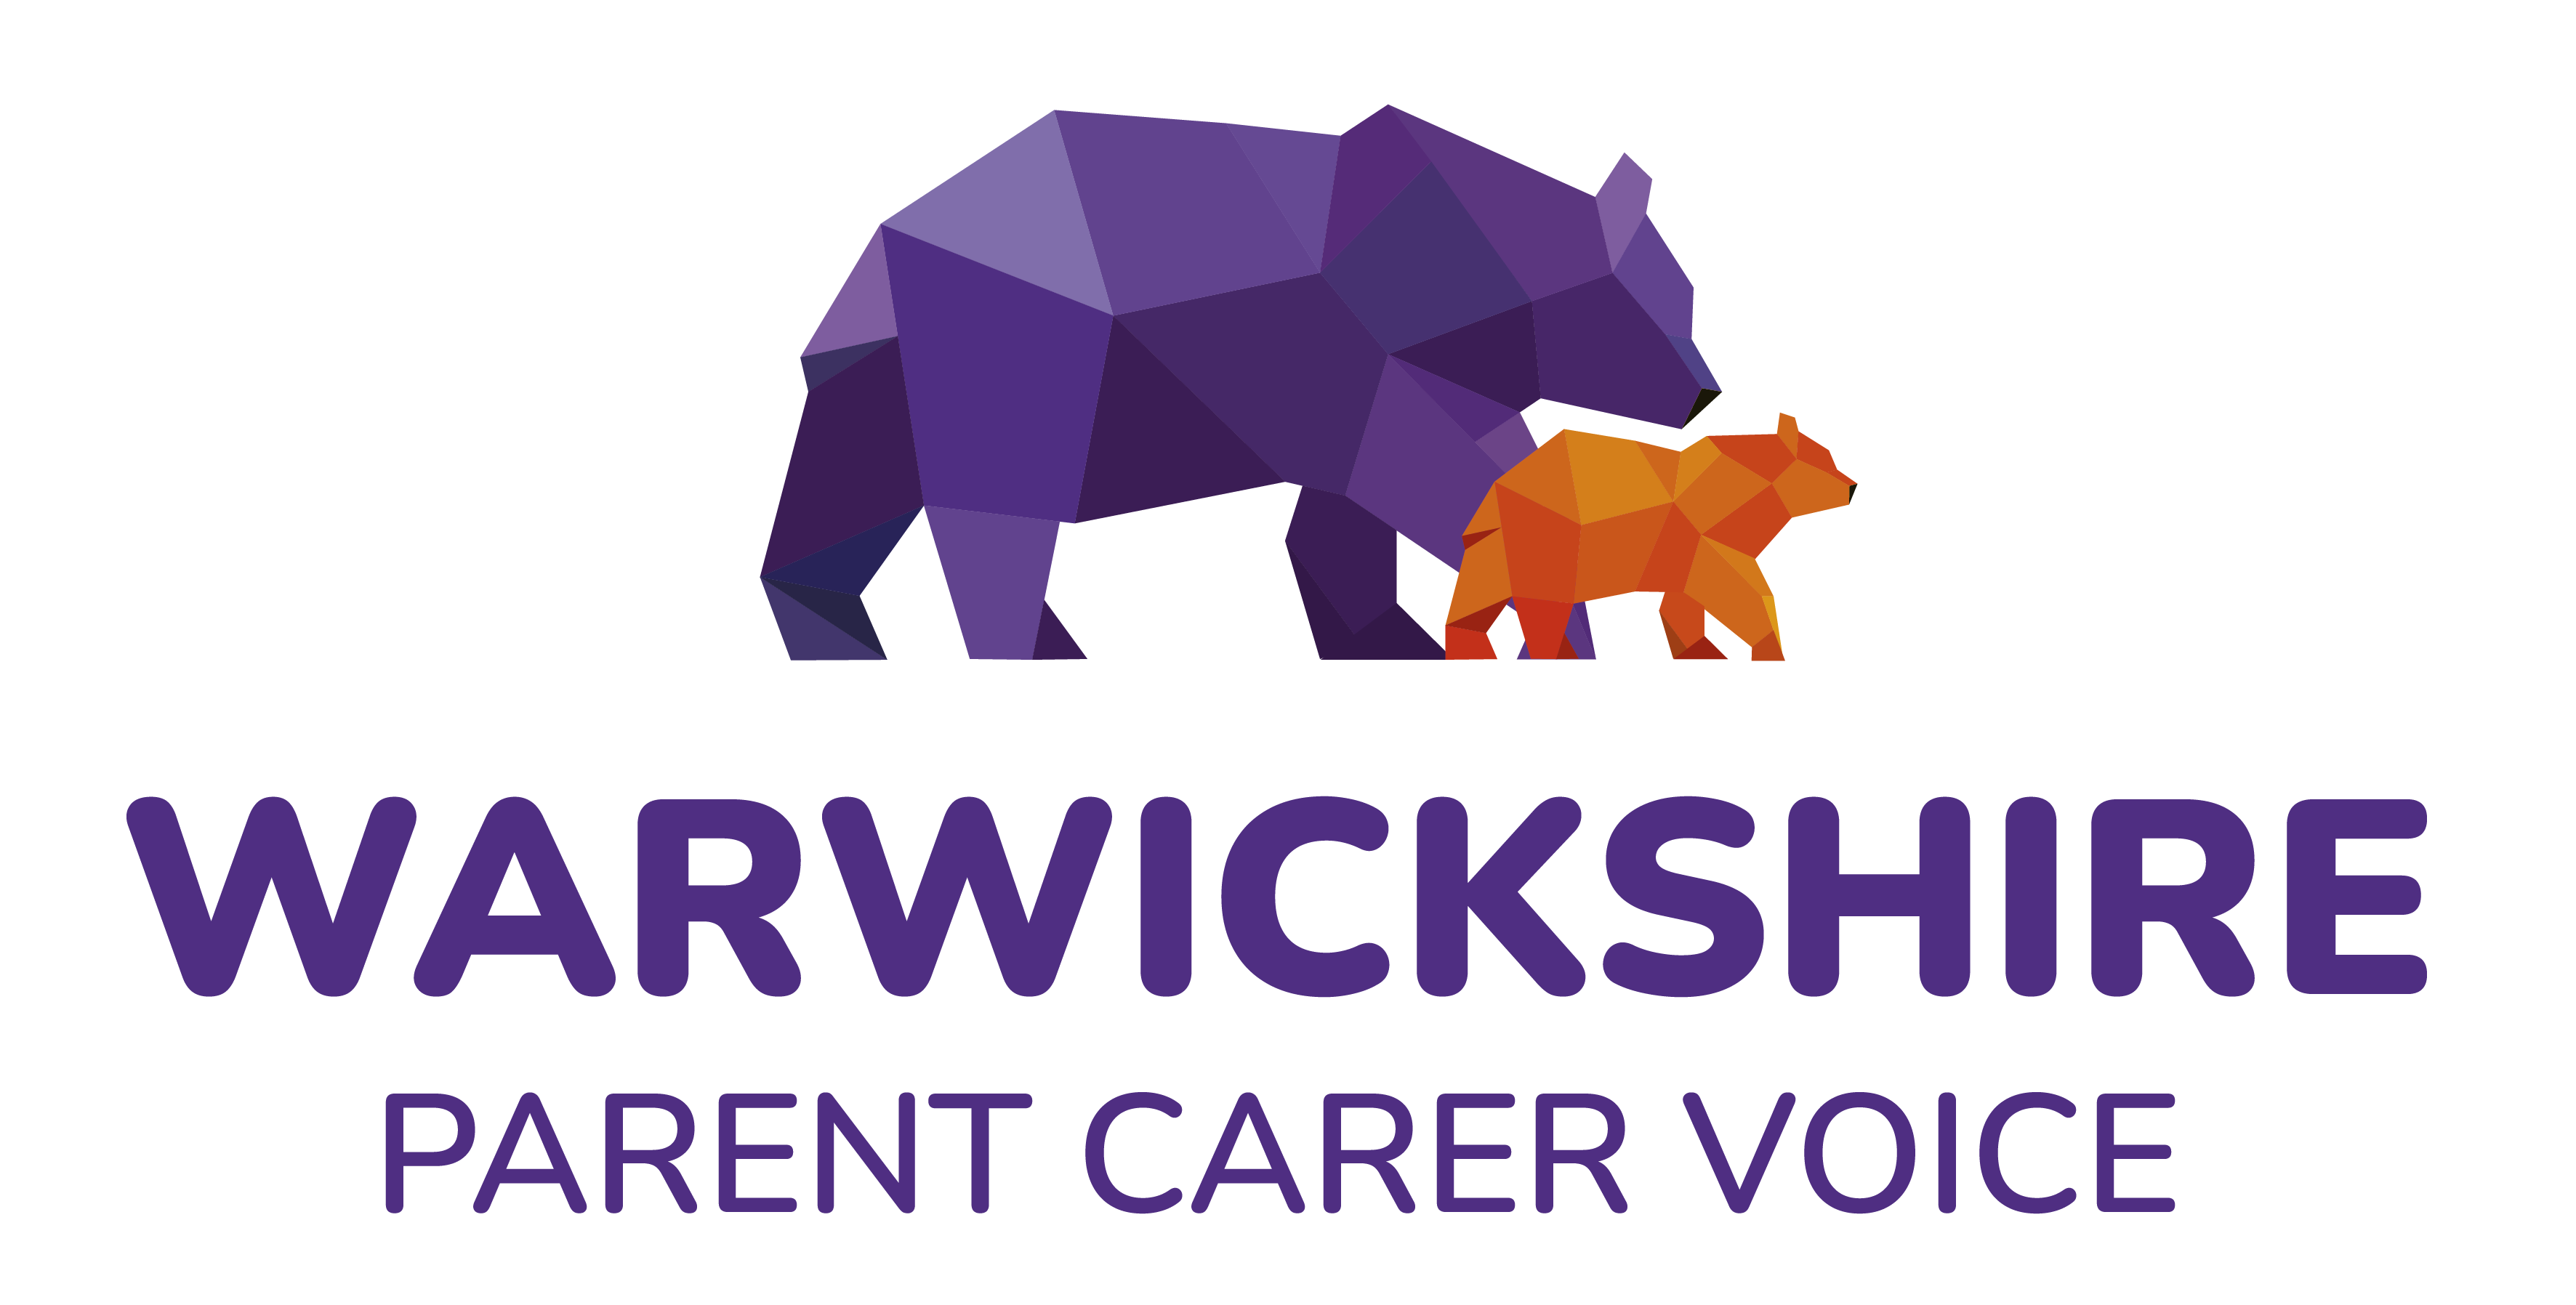 Warwickshire Parent Carer Voice